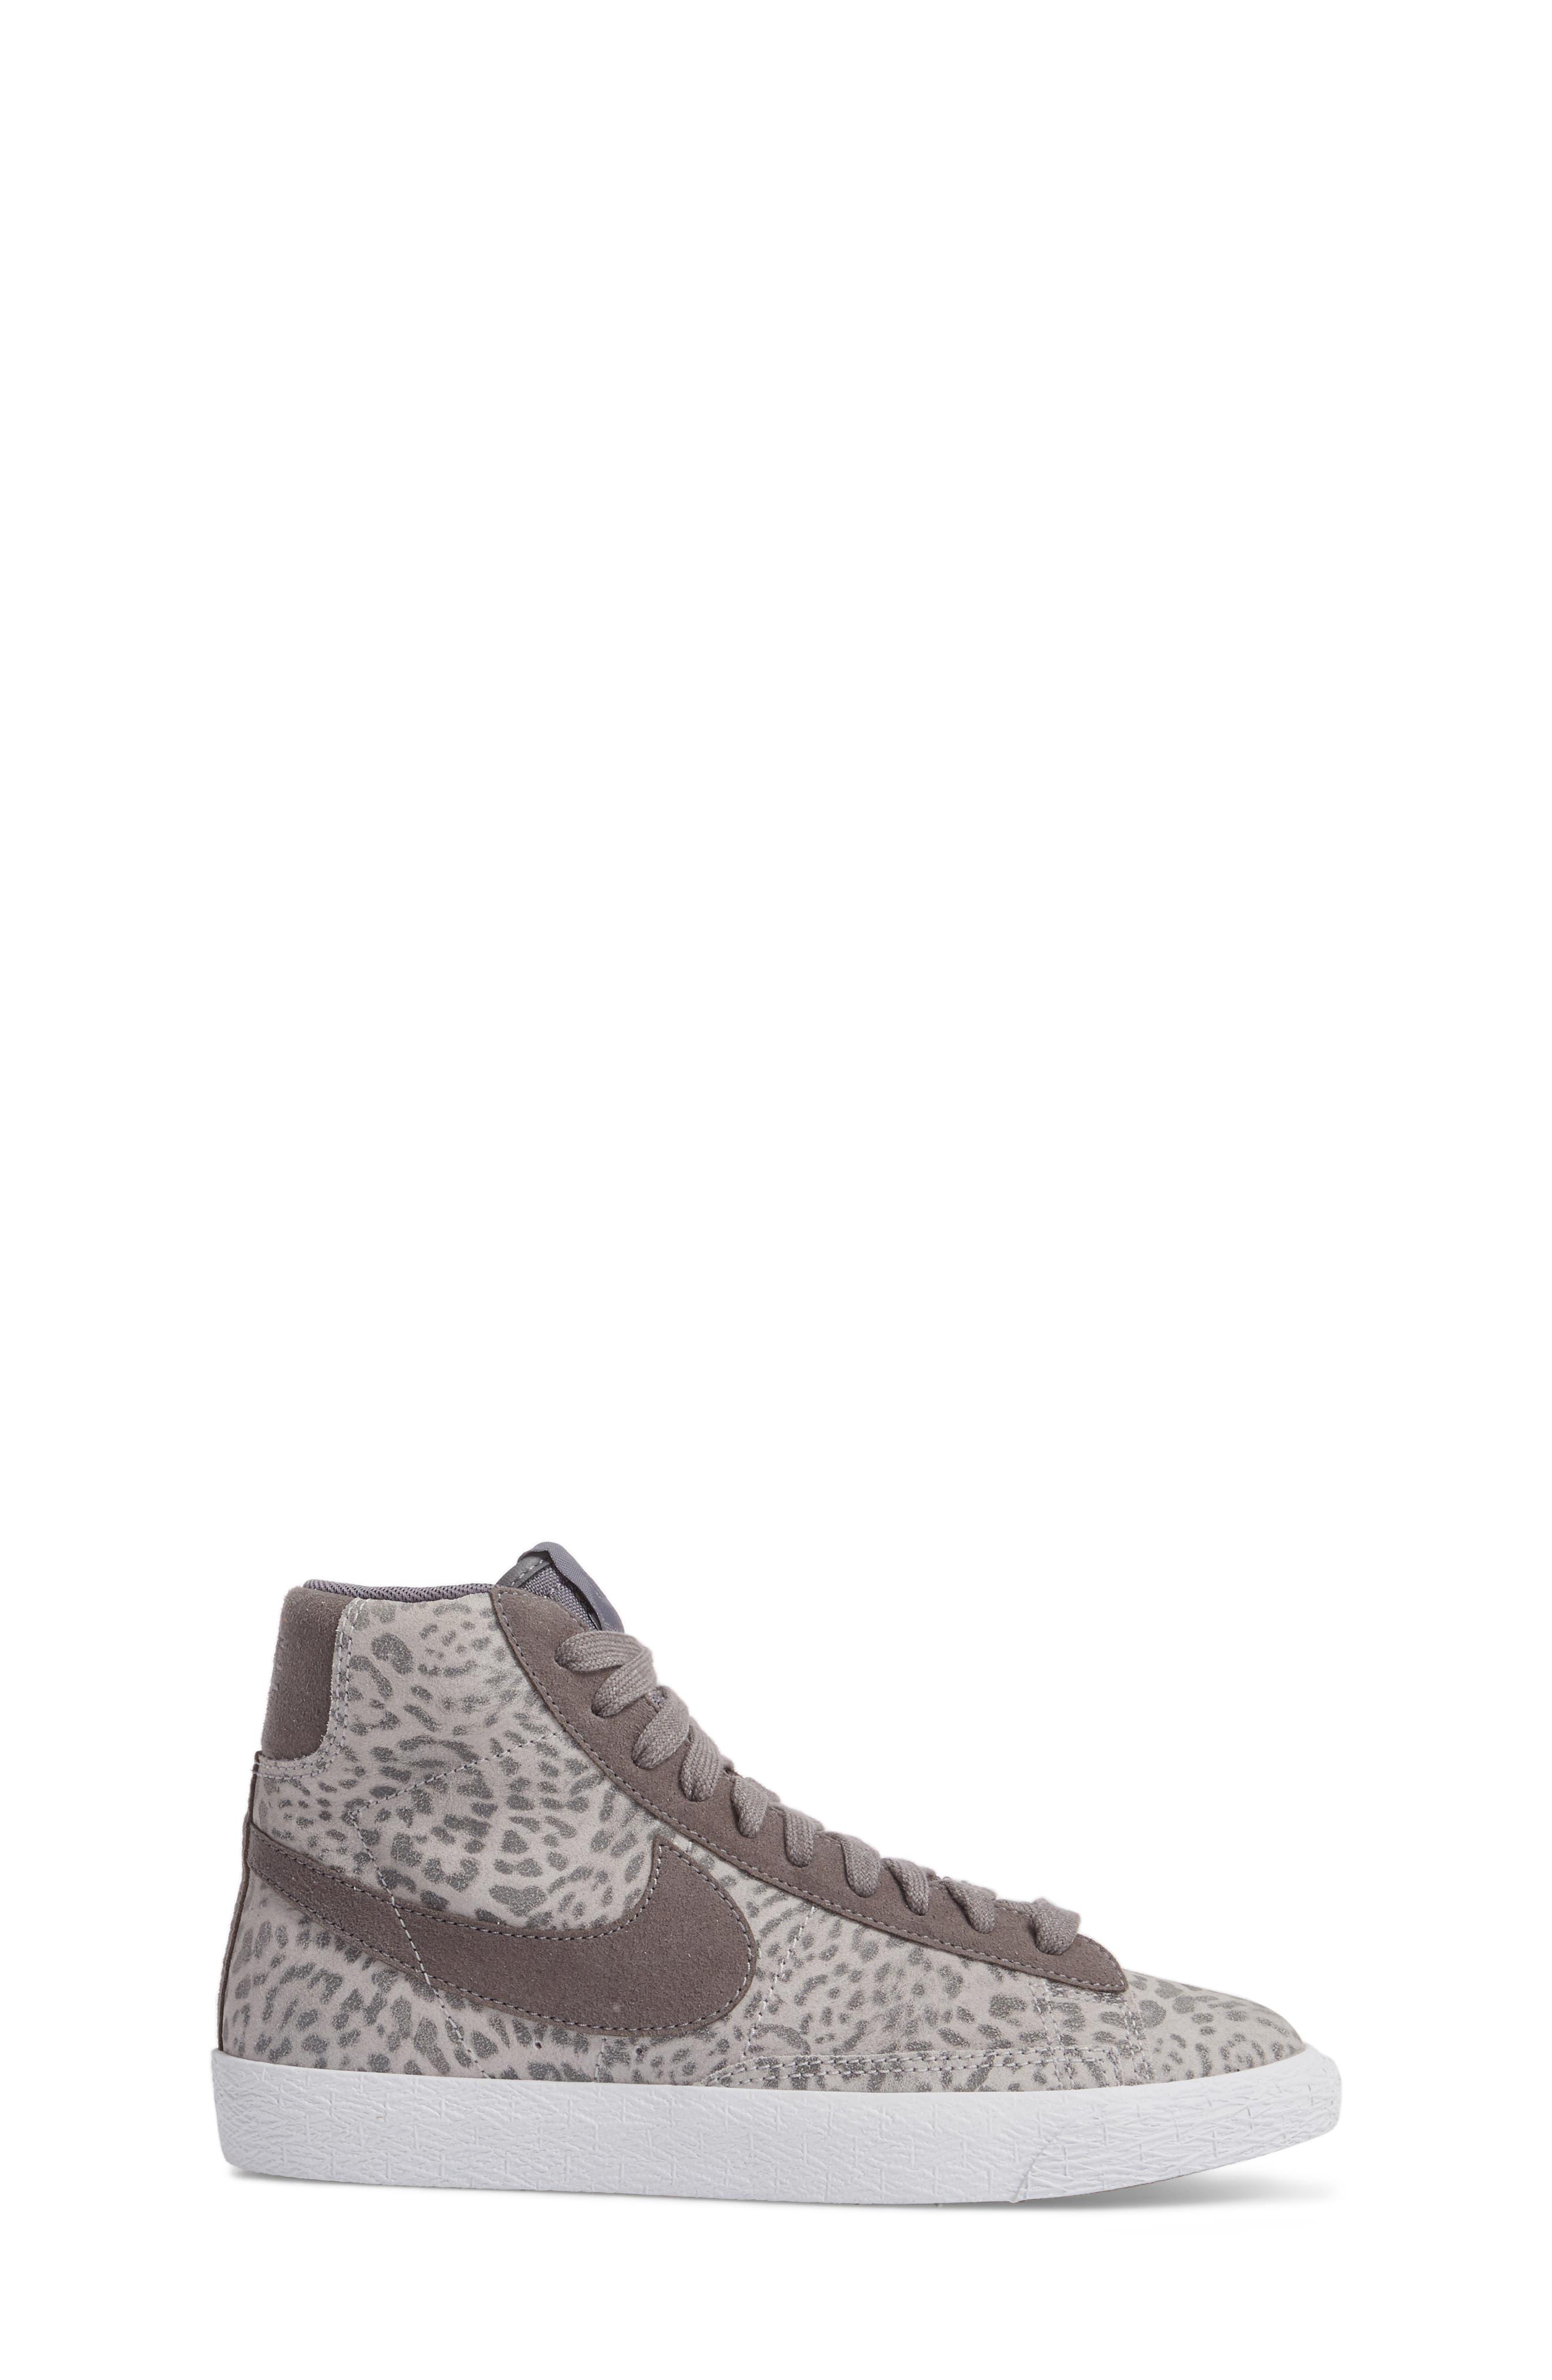 Blazer Mid SE High Top Sneaker,                             Alternate thumbnail 7, color,